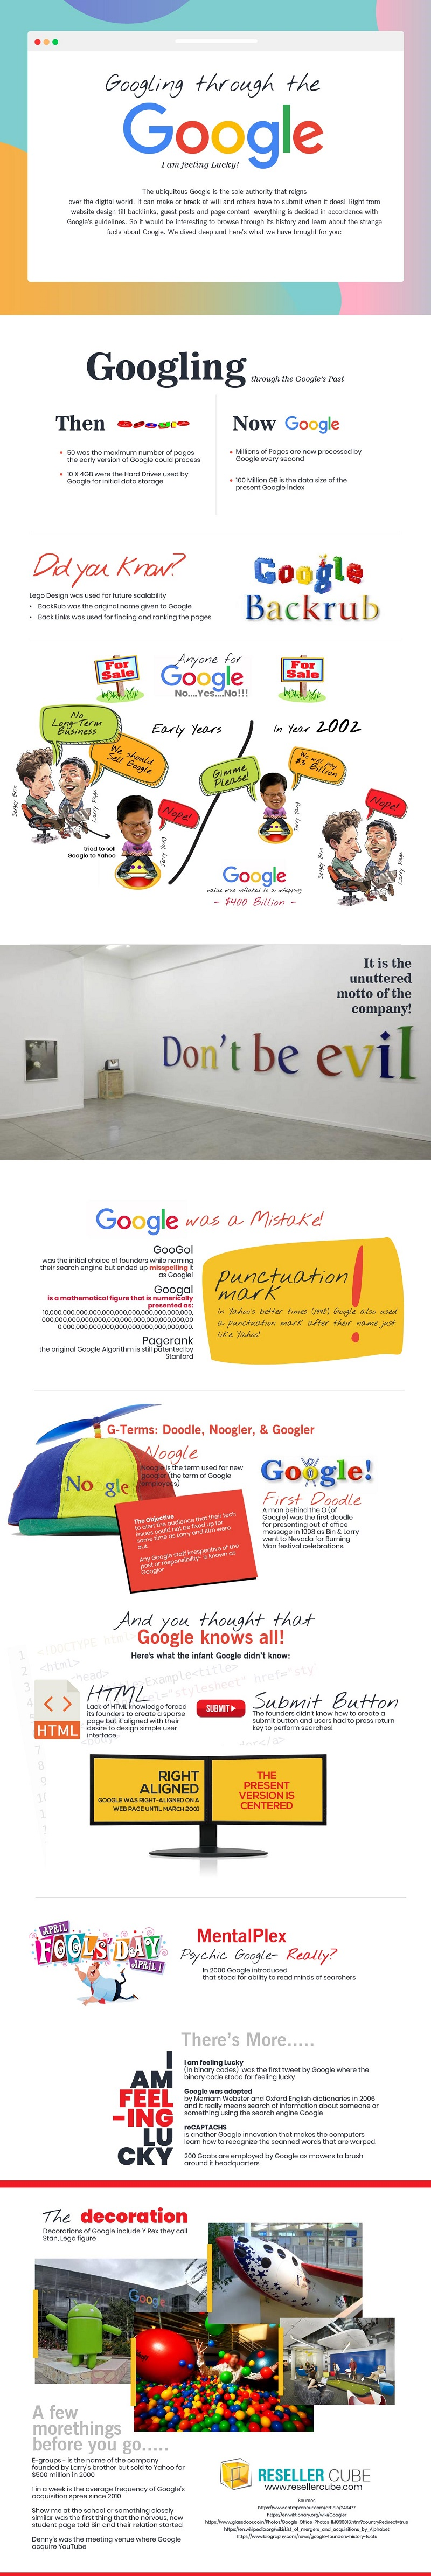 google-inforgraphic%20%28002%29.jpg